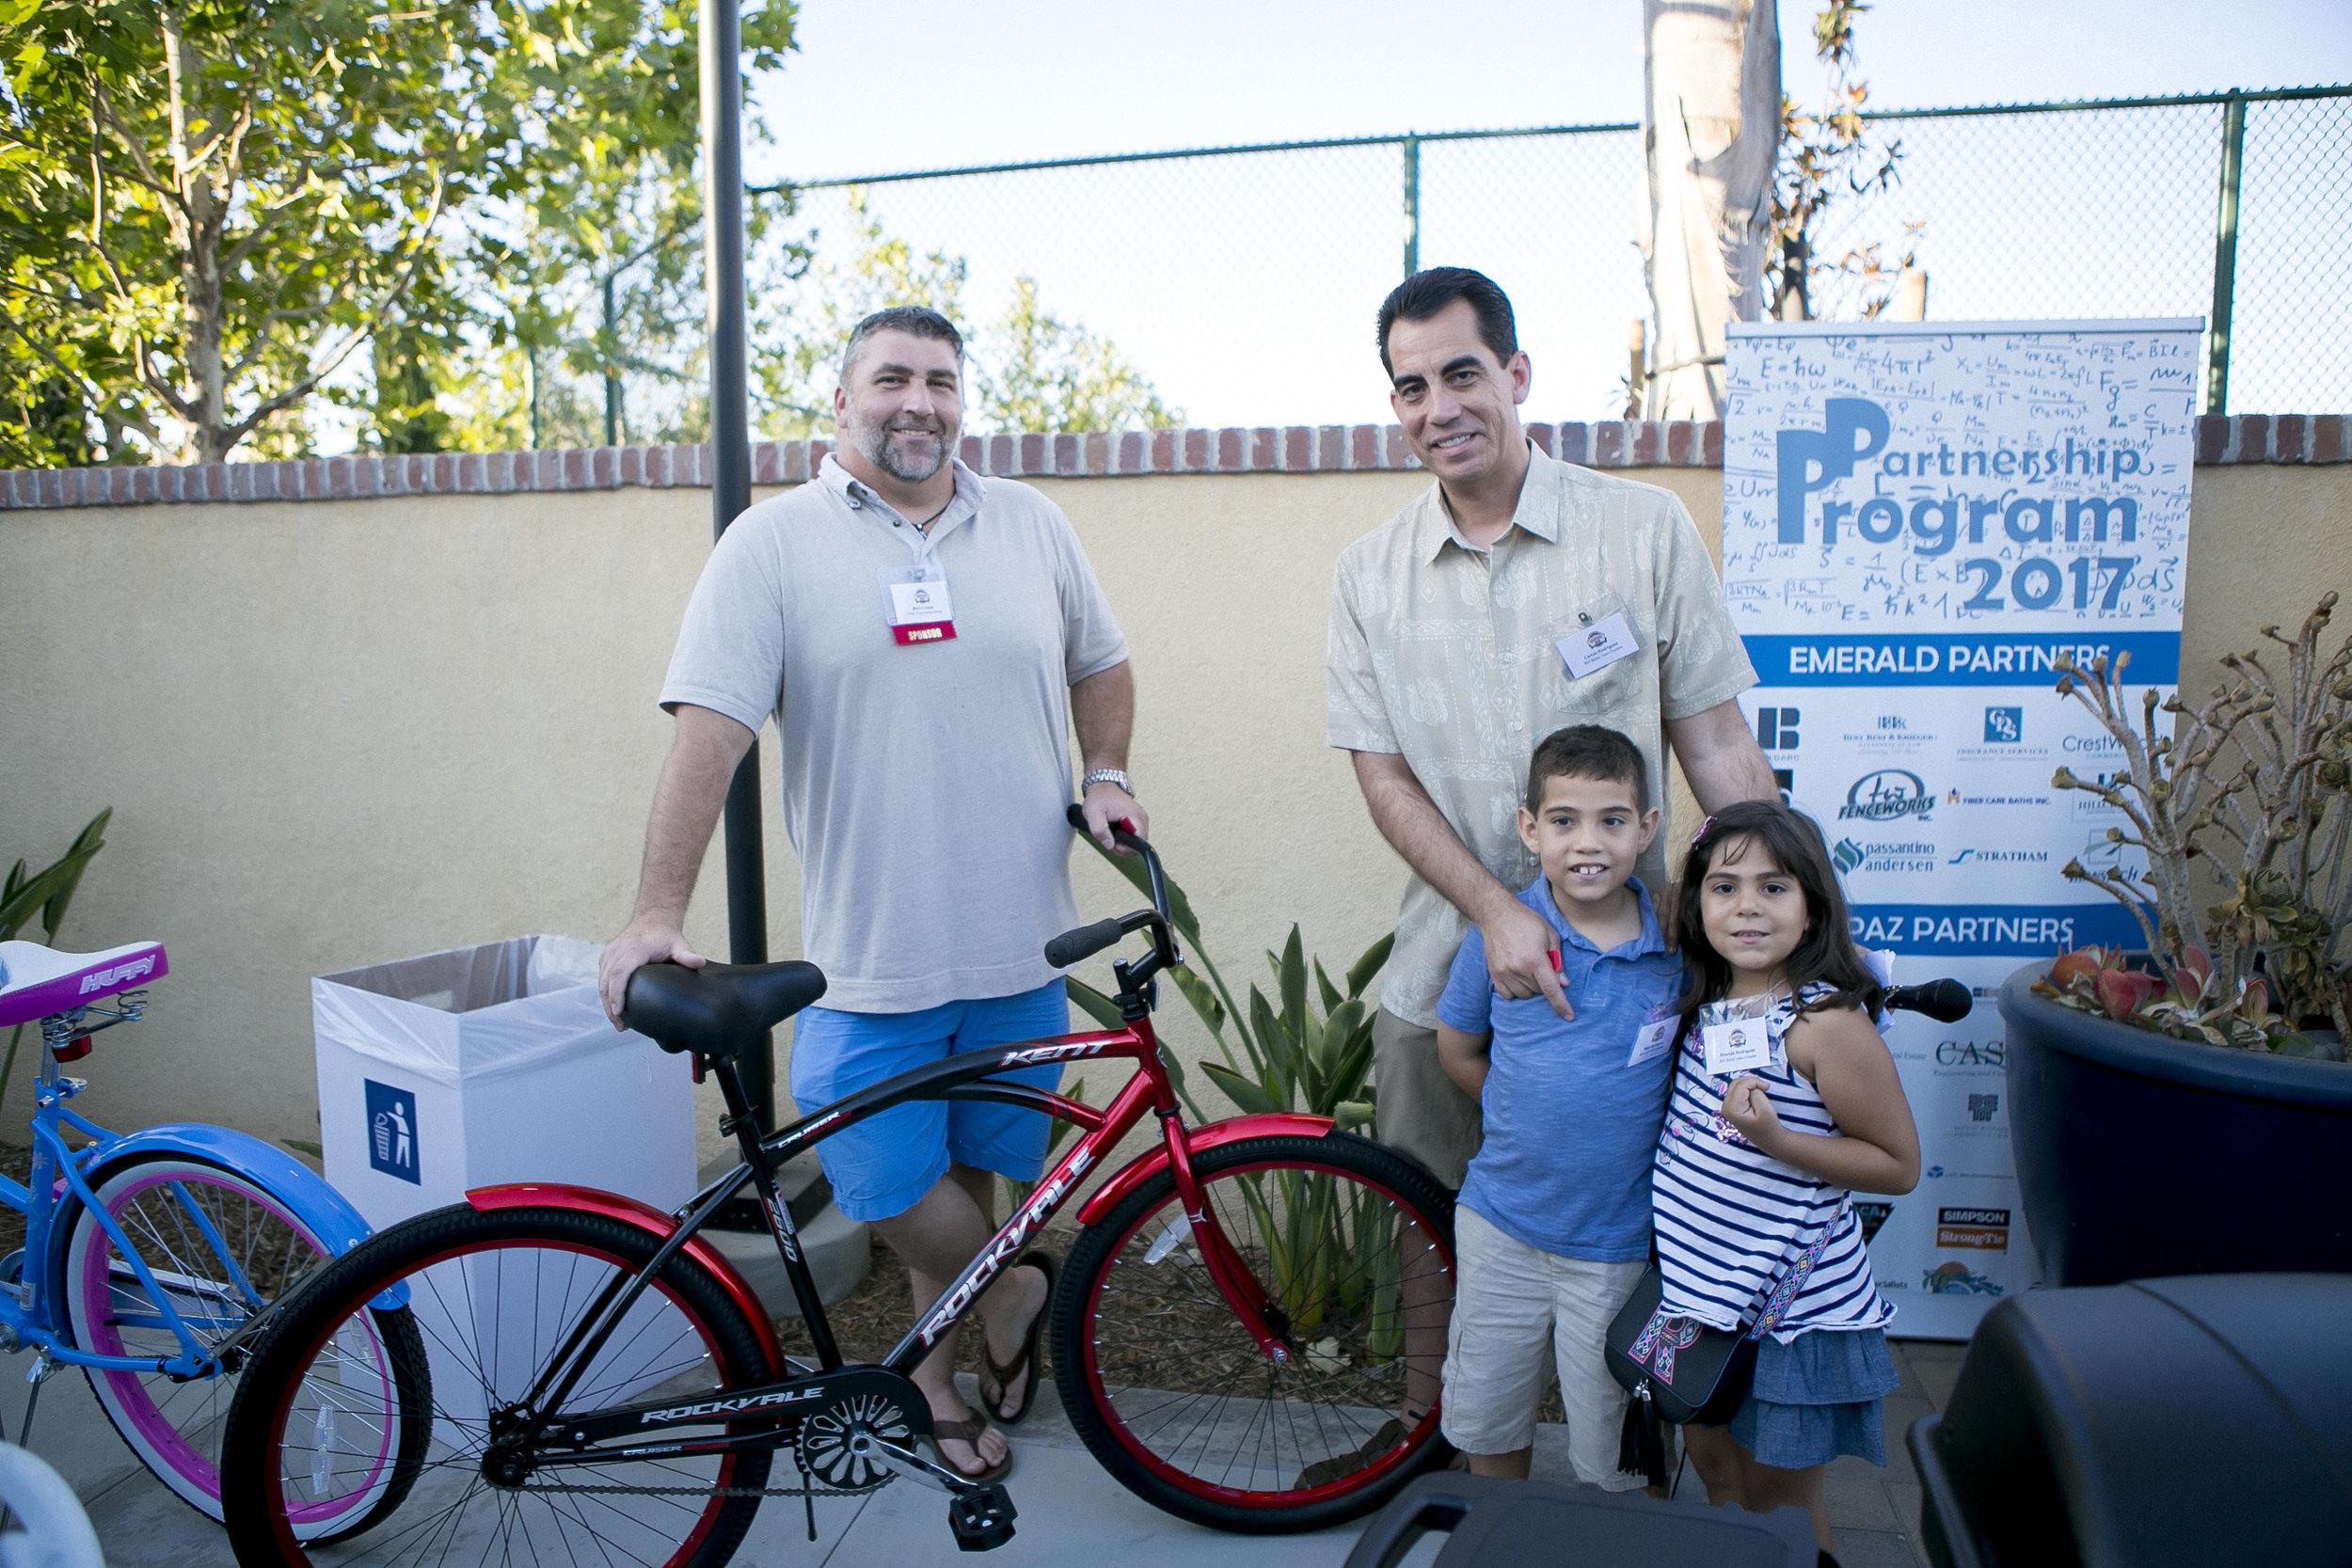 Men's Bike Winner:<br>Beau Cooper<br><i>United Engineering Group</i>